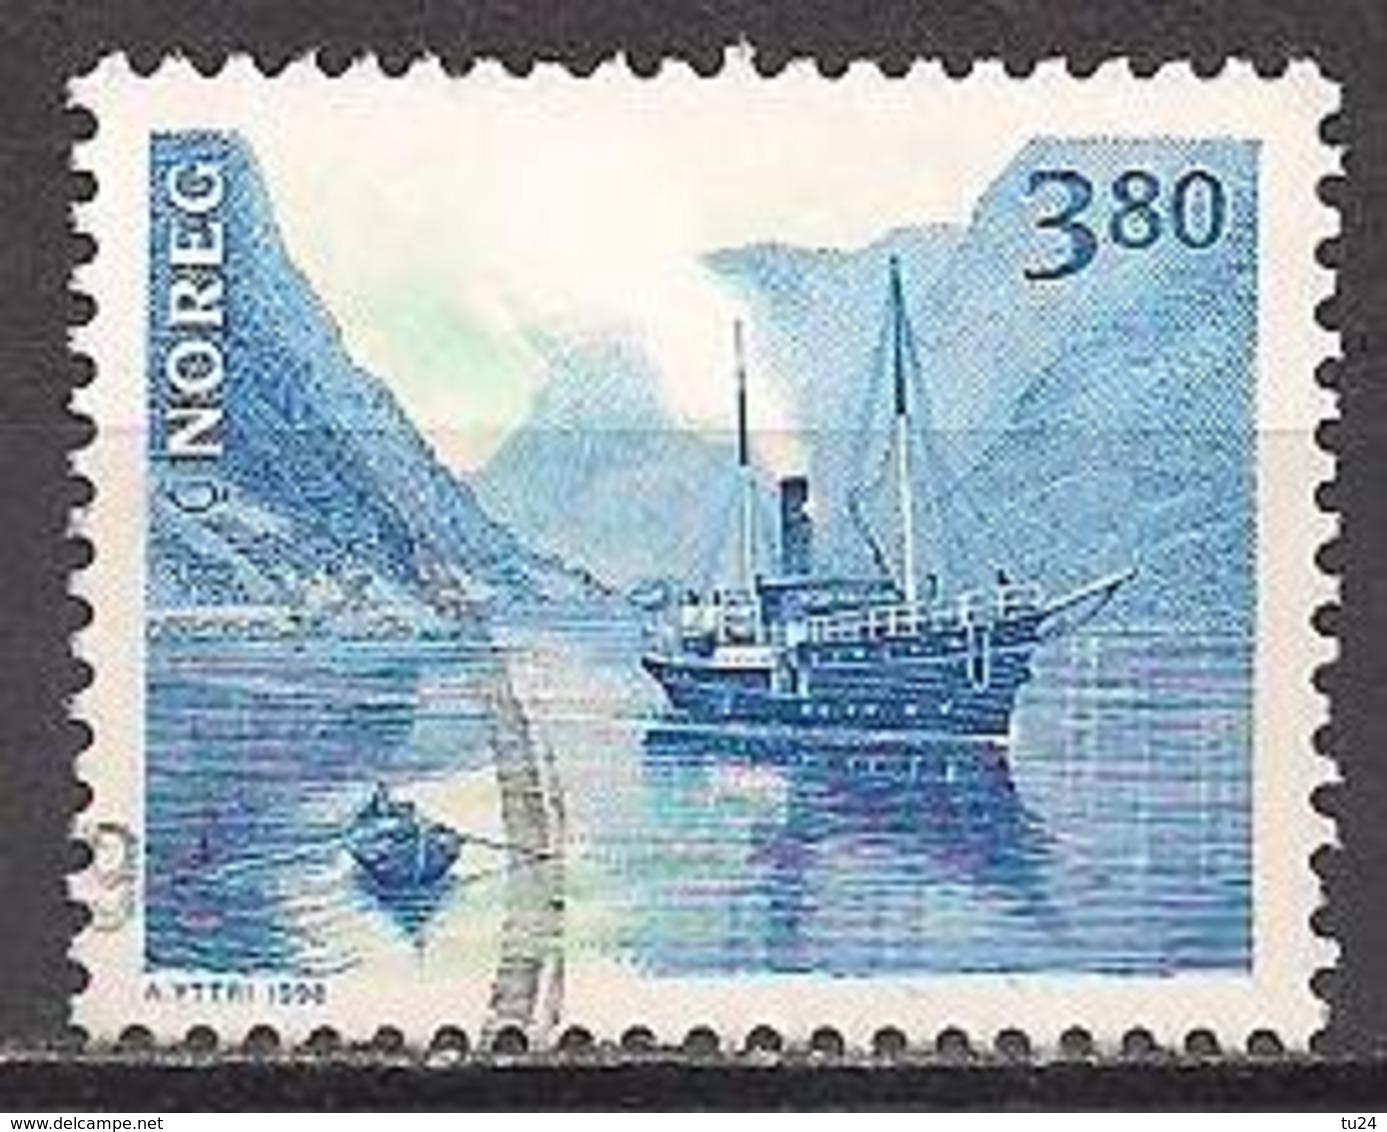 Norwegen  (1998)  Mi.Nr.  1280  Gest. / Used  (10ad50)  NORDEN - Gebraucht